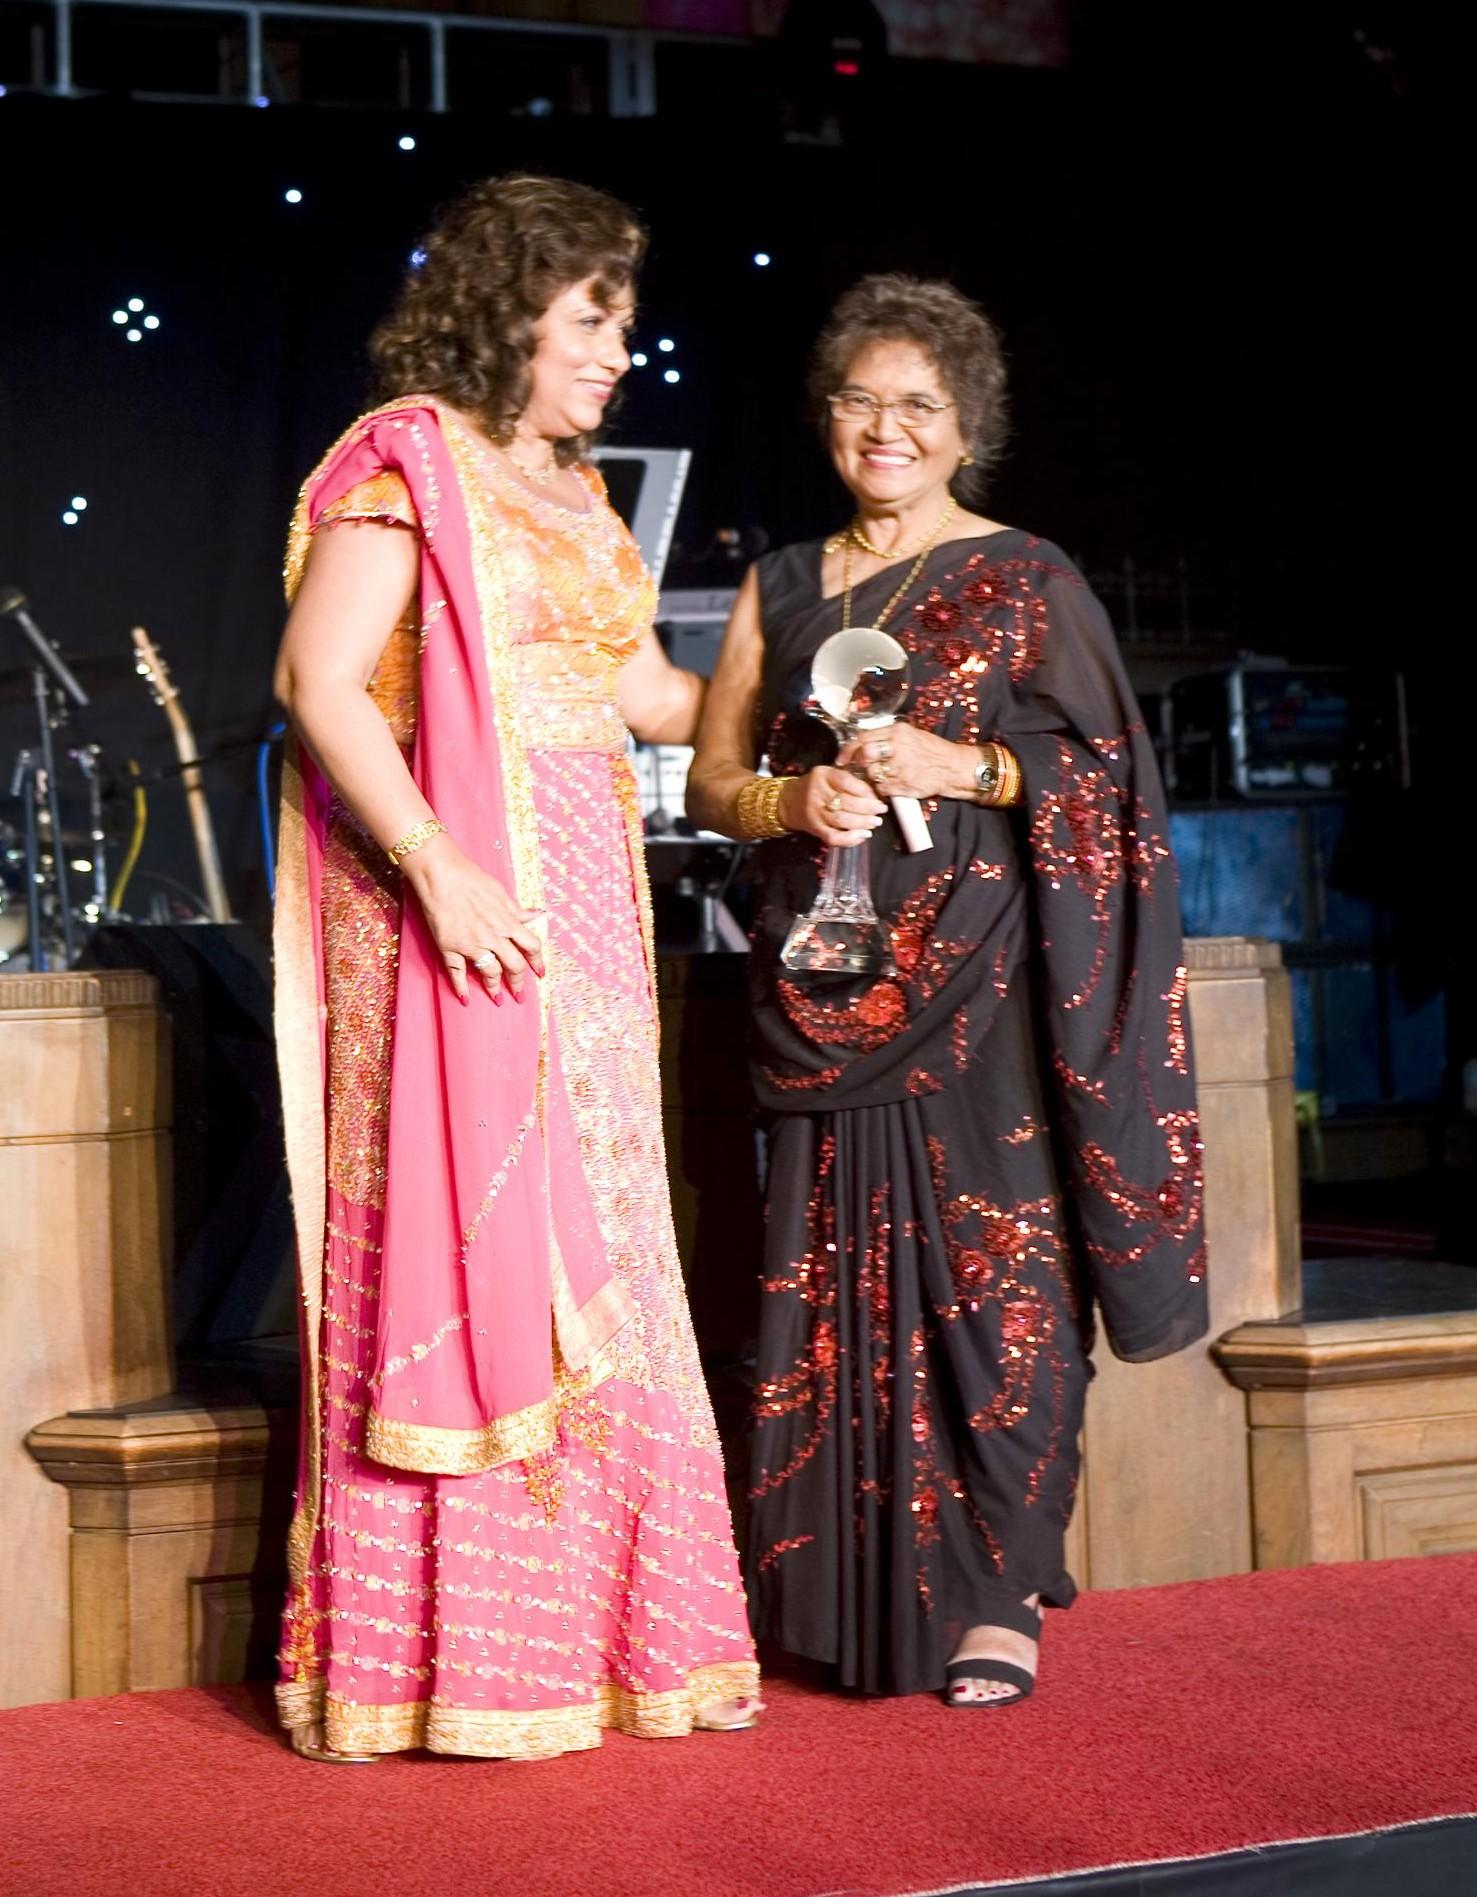 Doris Wiratunga